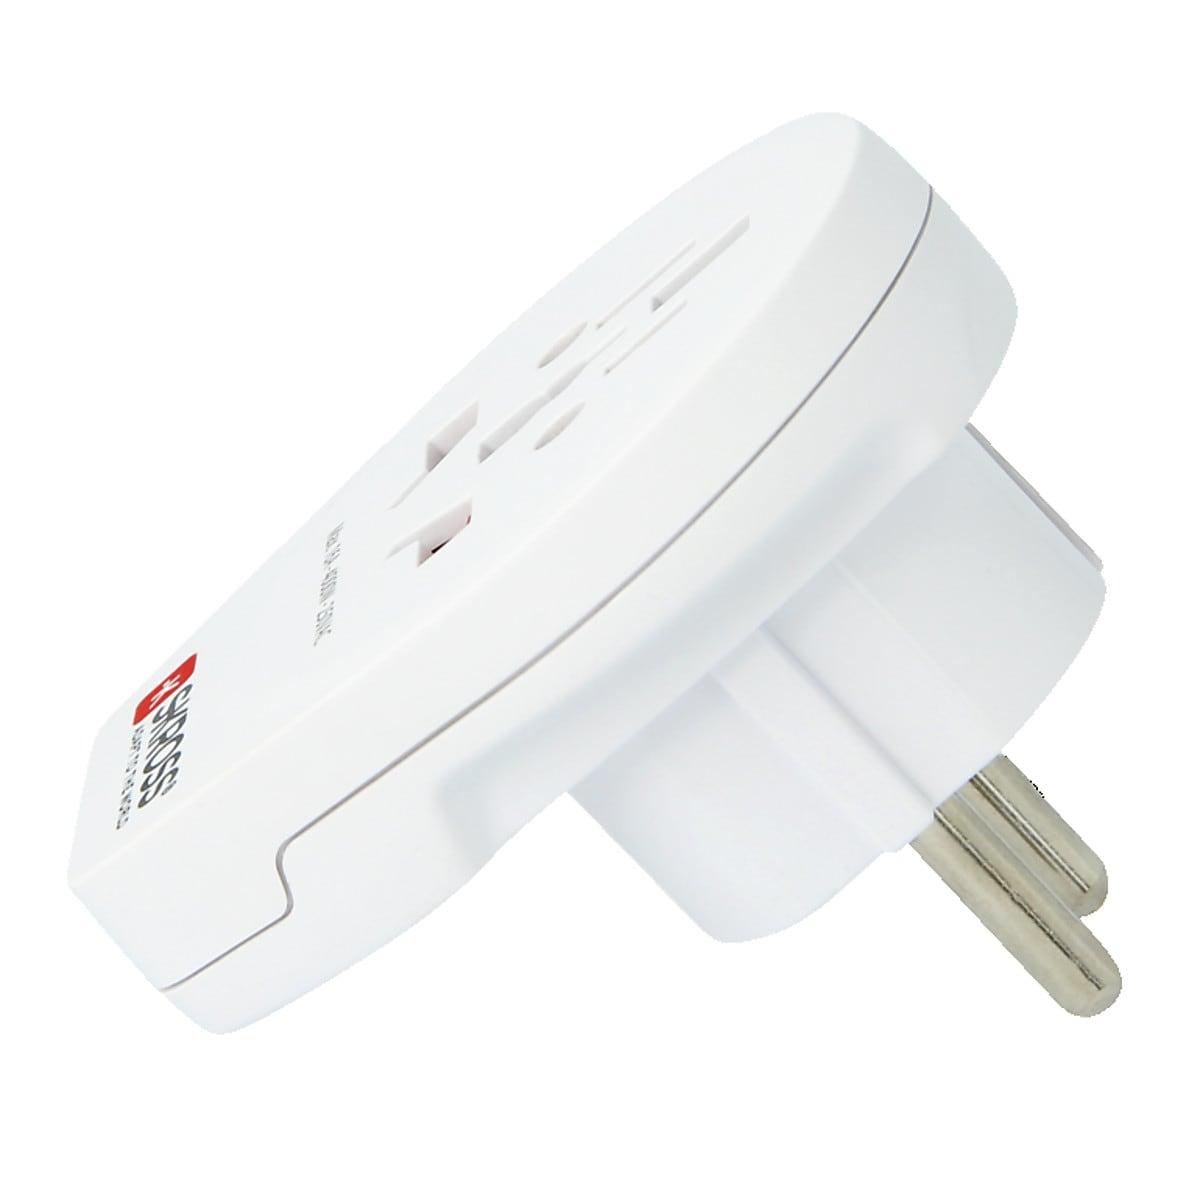 SKROSS World to Europe USB reiseadapter